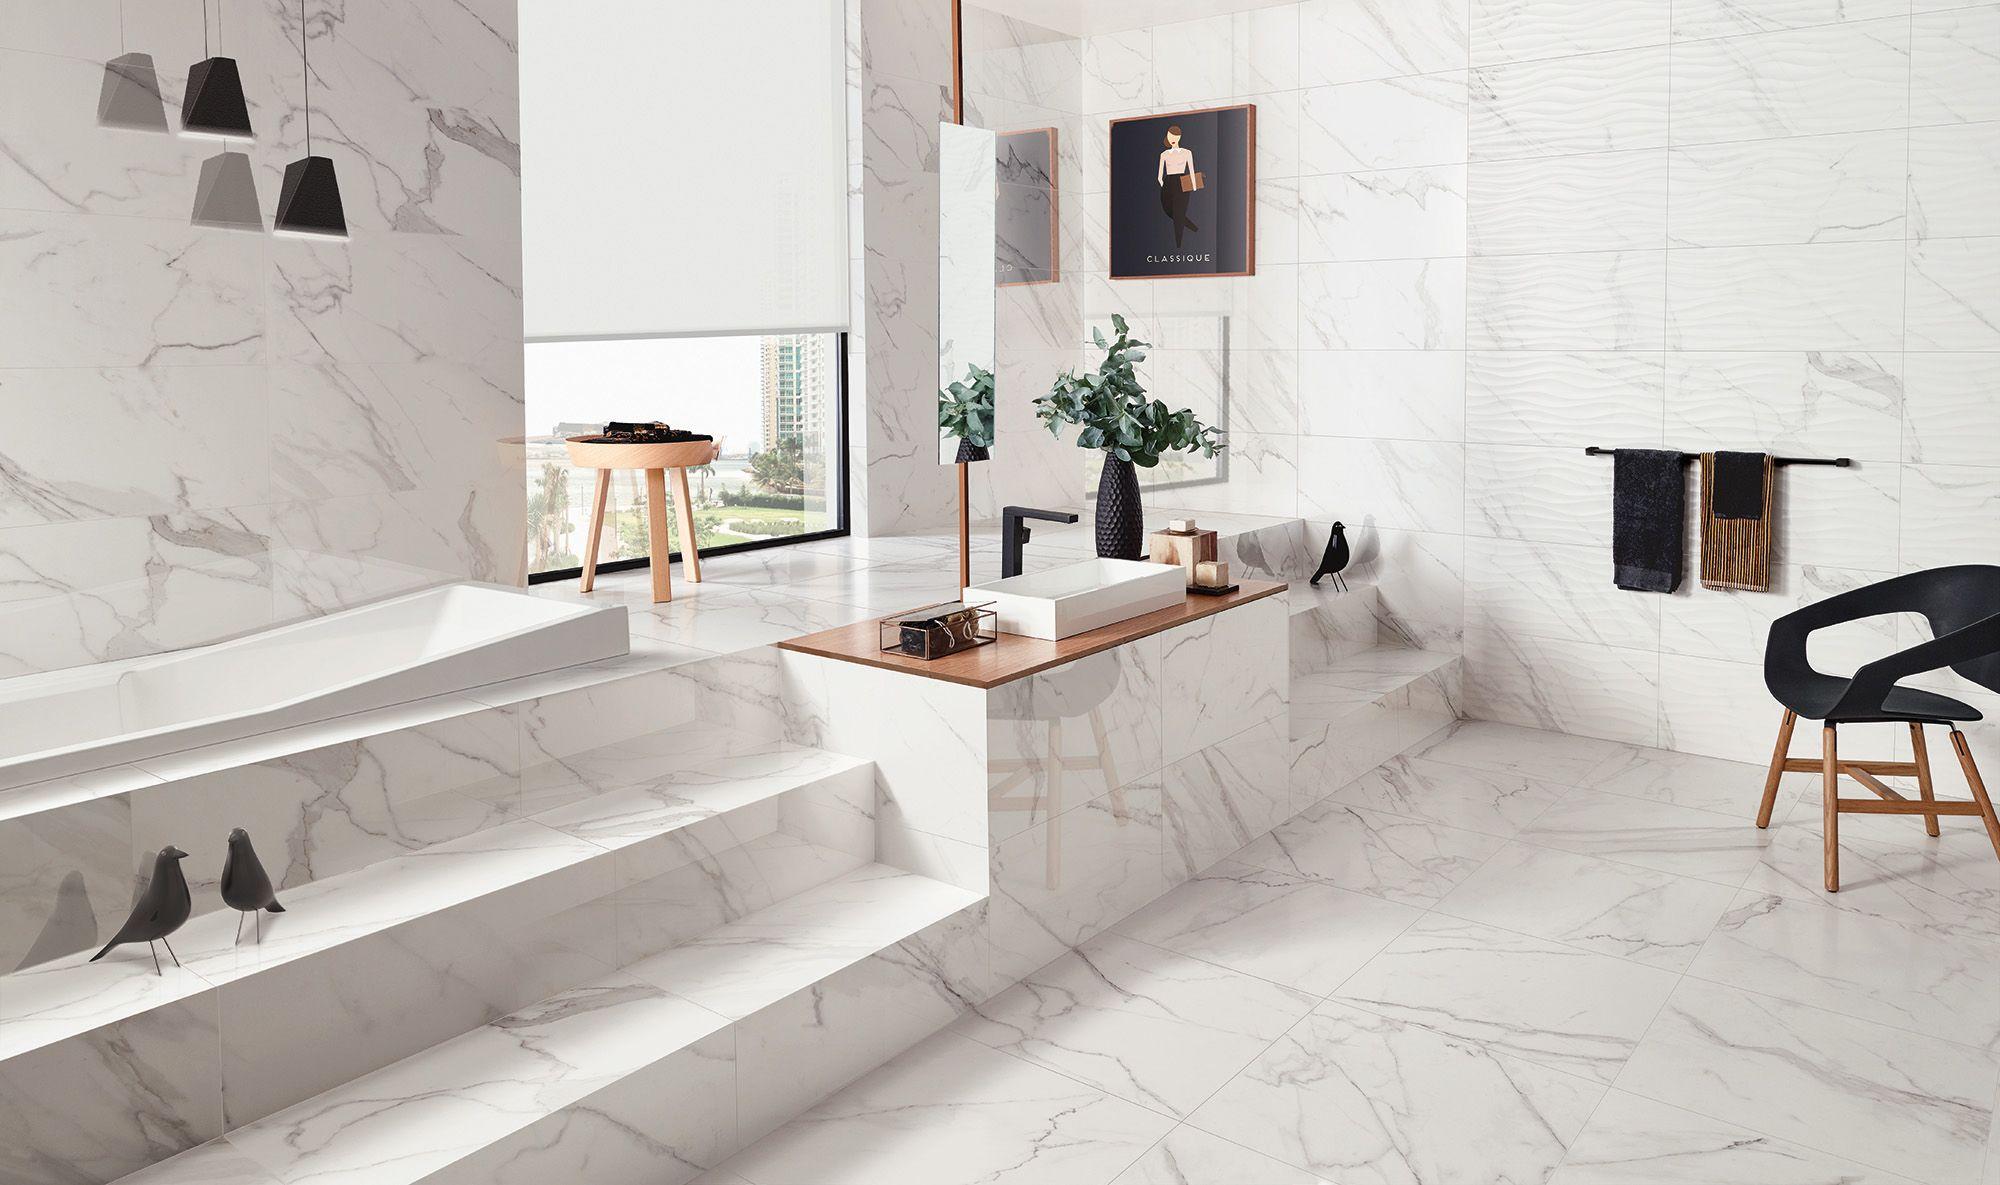 24x24 Floor Tile 14x27 Wall Tile And 14x27 Curl Deco In Calacatta Best Bathroom Flooring Bathroom Tile Designs Bathroom Flooring